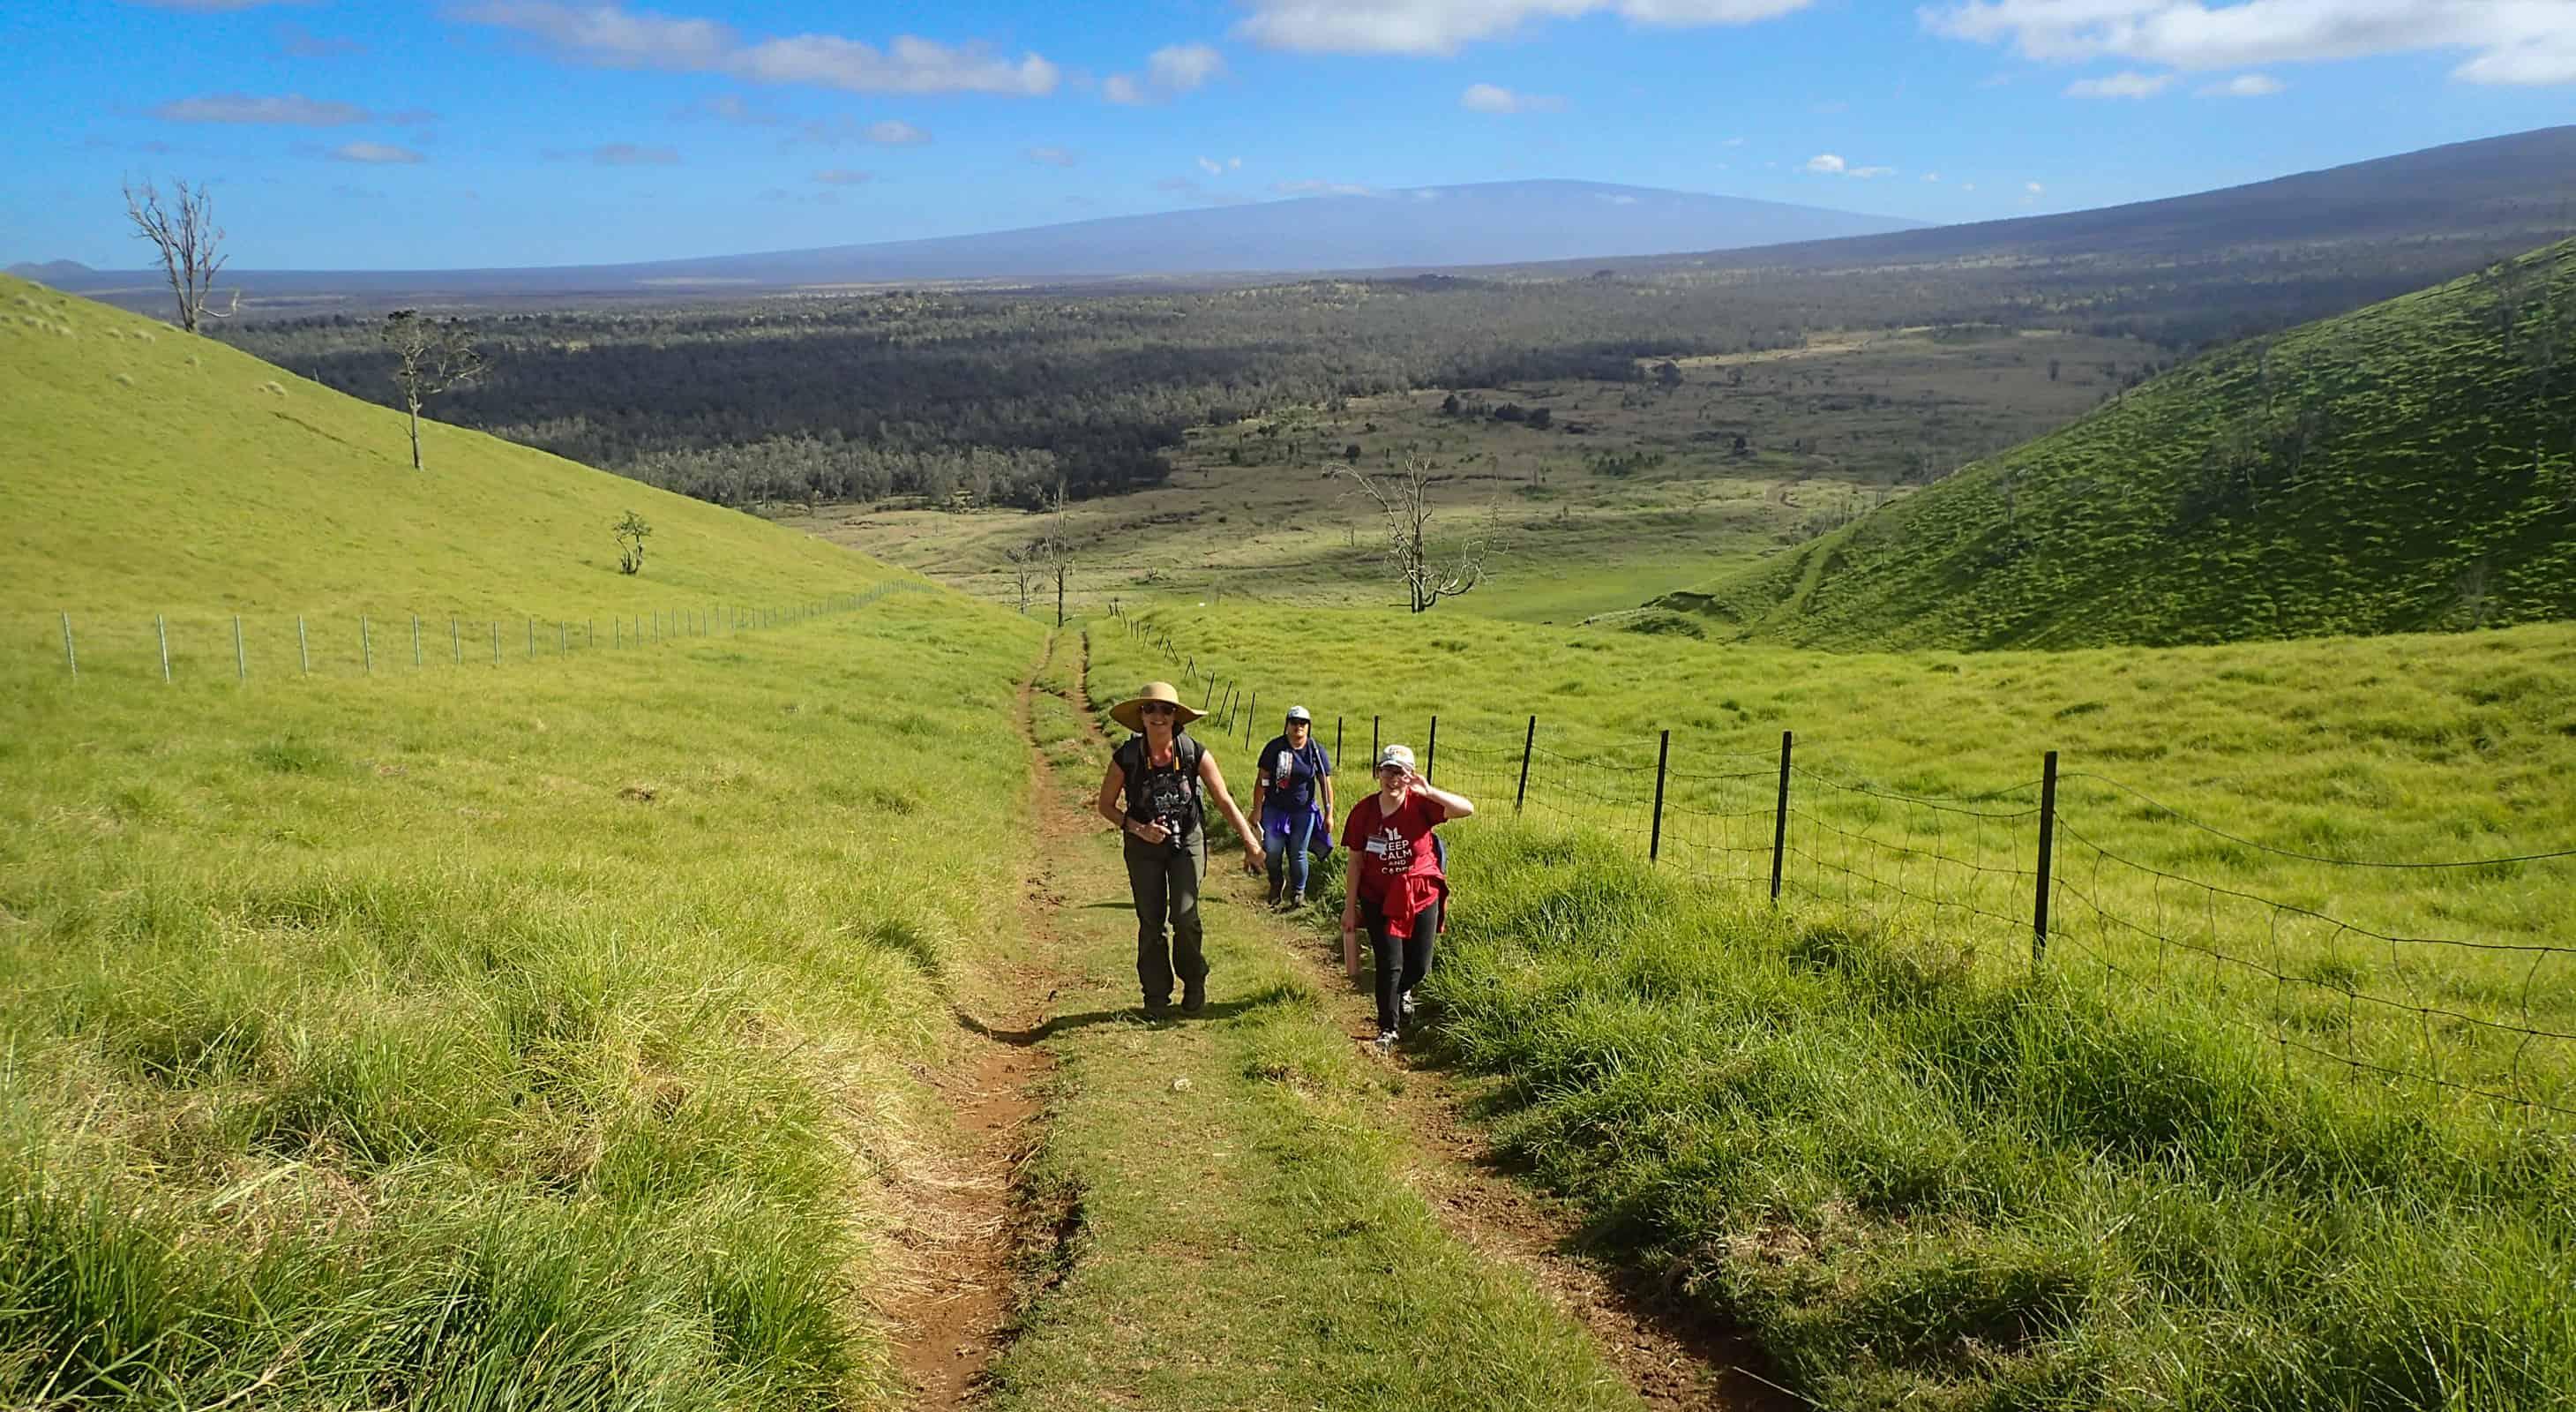 A small group walking up the road to Puʻuwaʻawaʻa